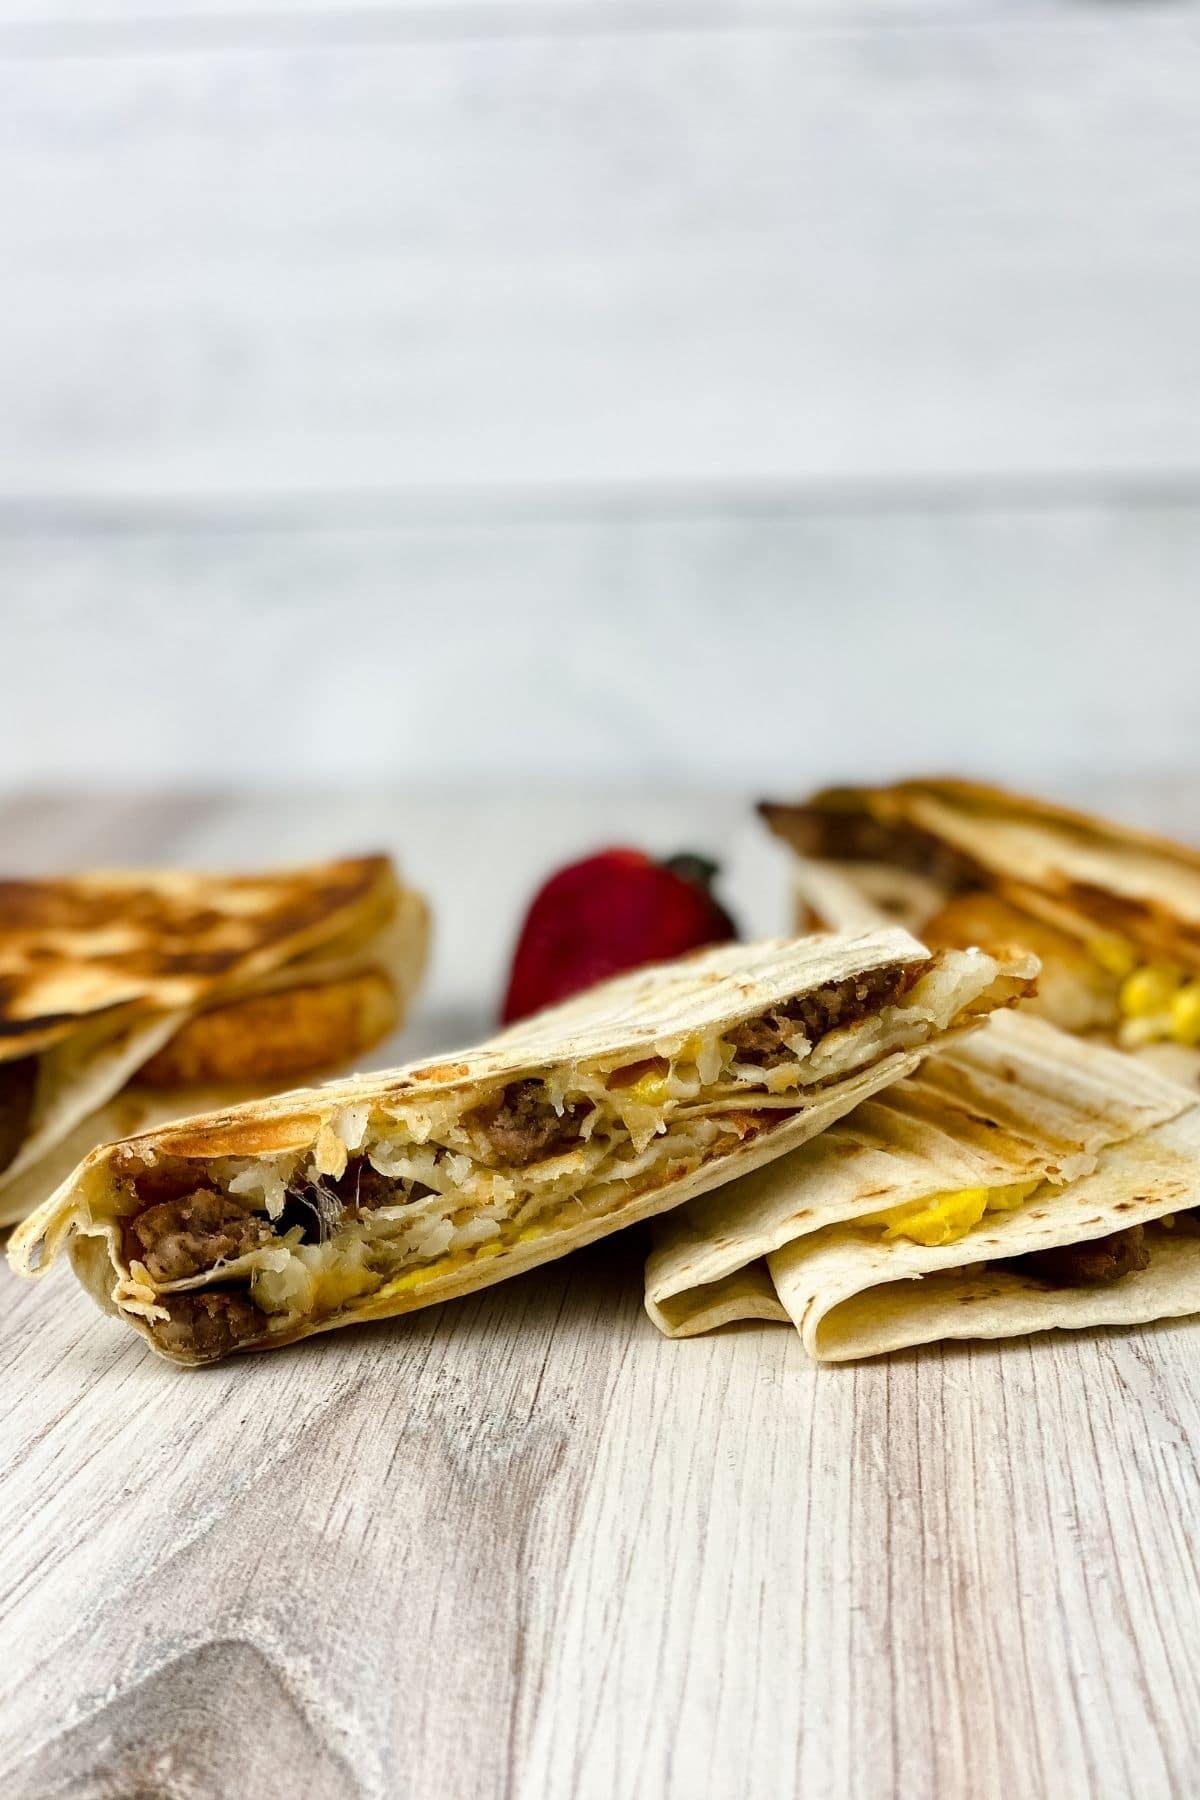 Stack of breakfast wraps